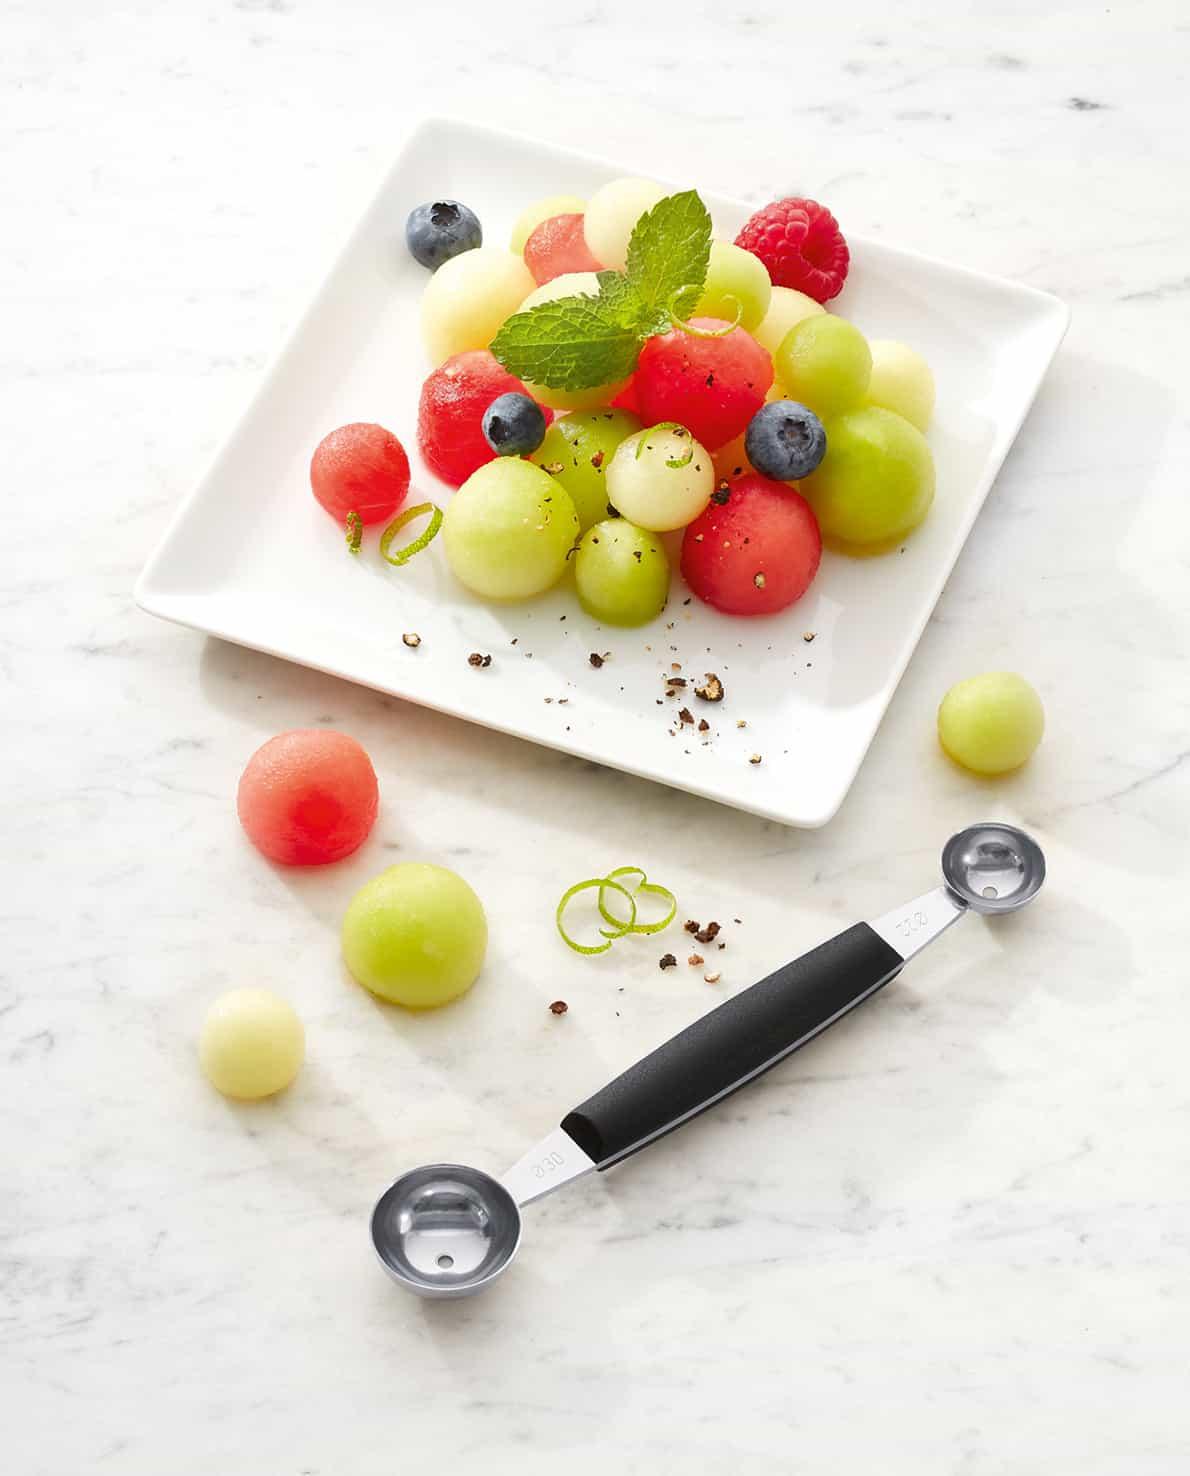 triangle Kugelformer professional doppelt mit Melonenbällchen und Melonensalat Obstsalat Melonenausstecher